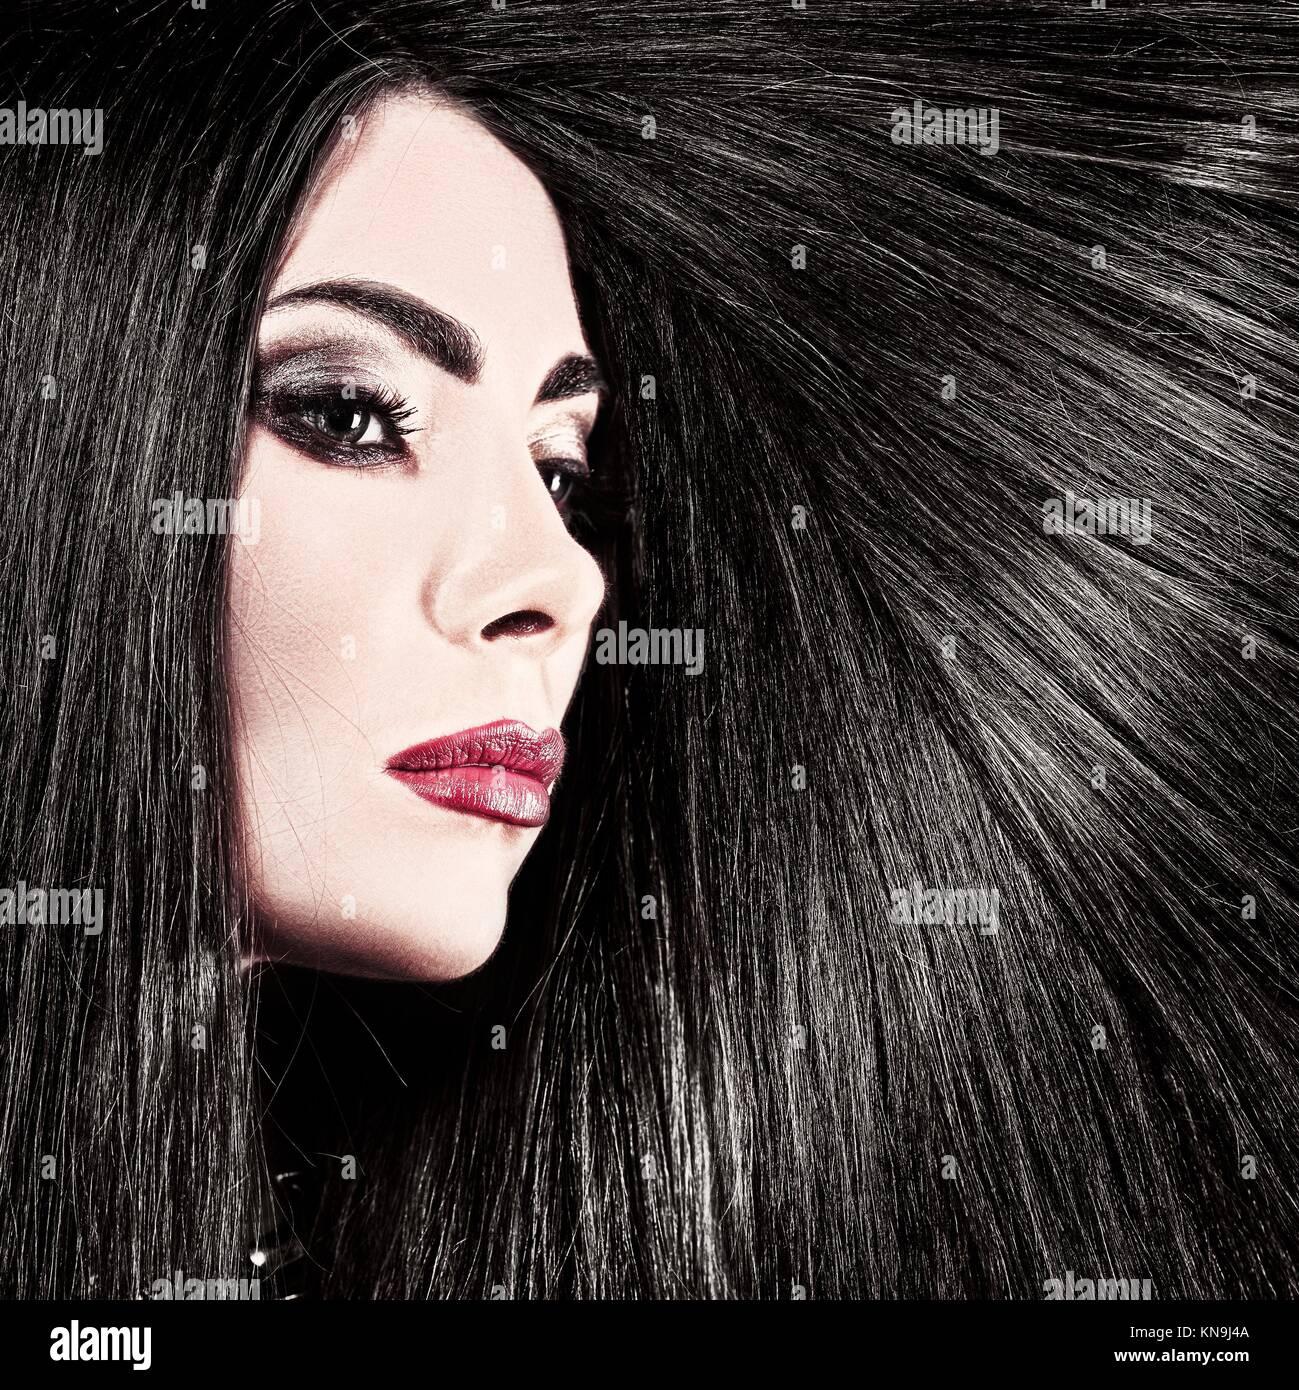 Hair. Beauty female portrait health care concept. - Stock Image